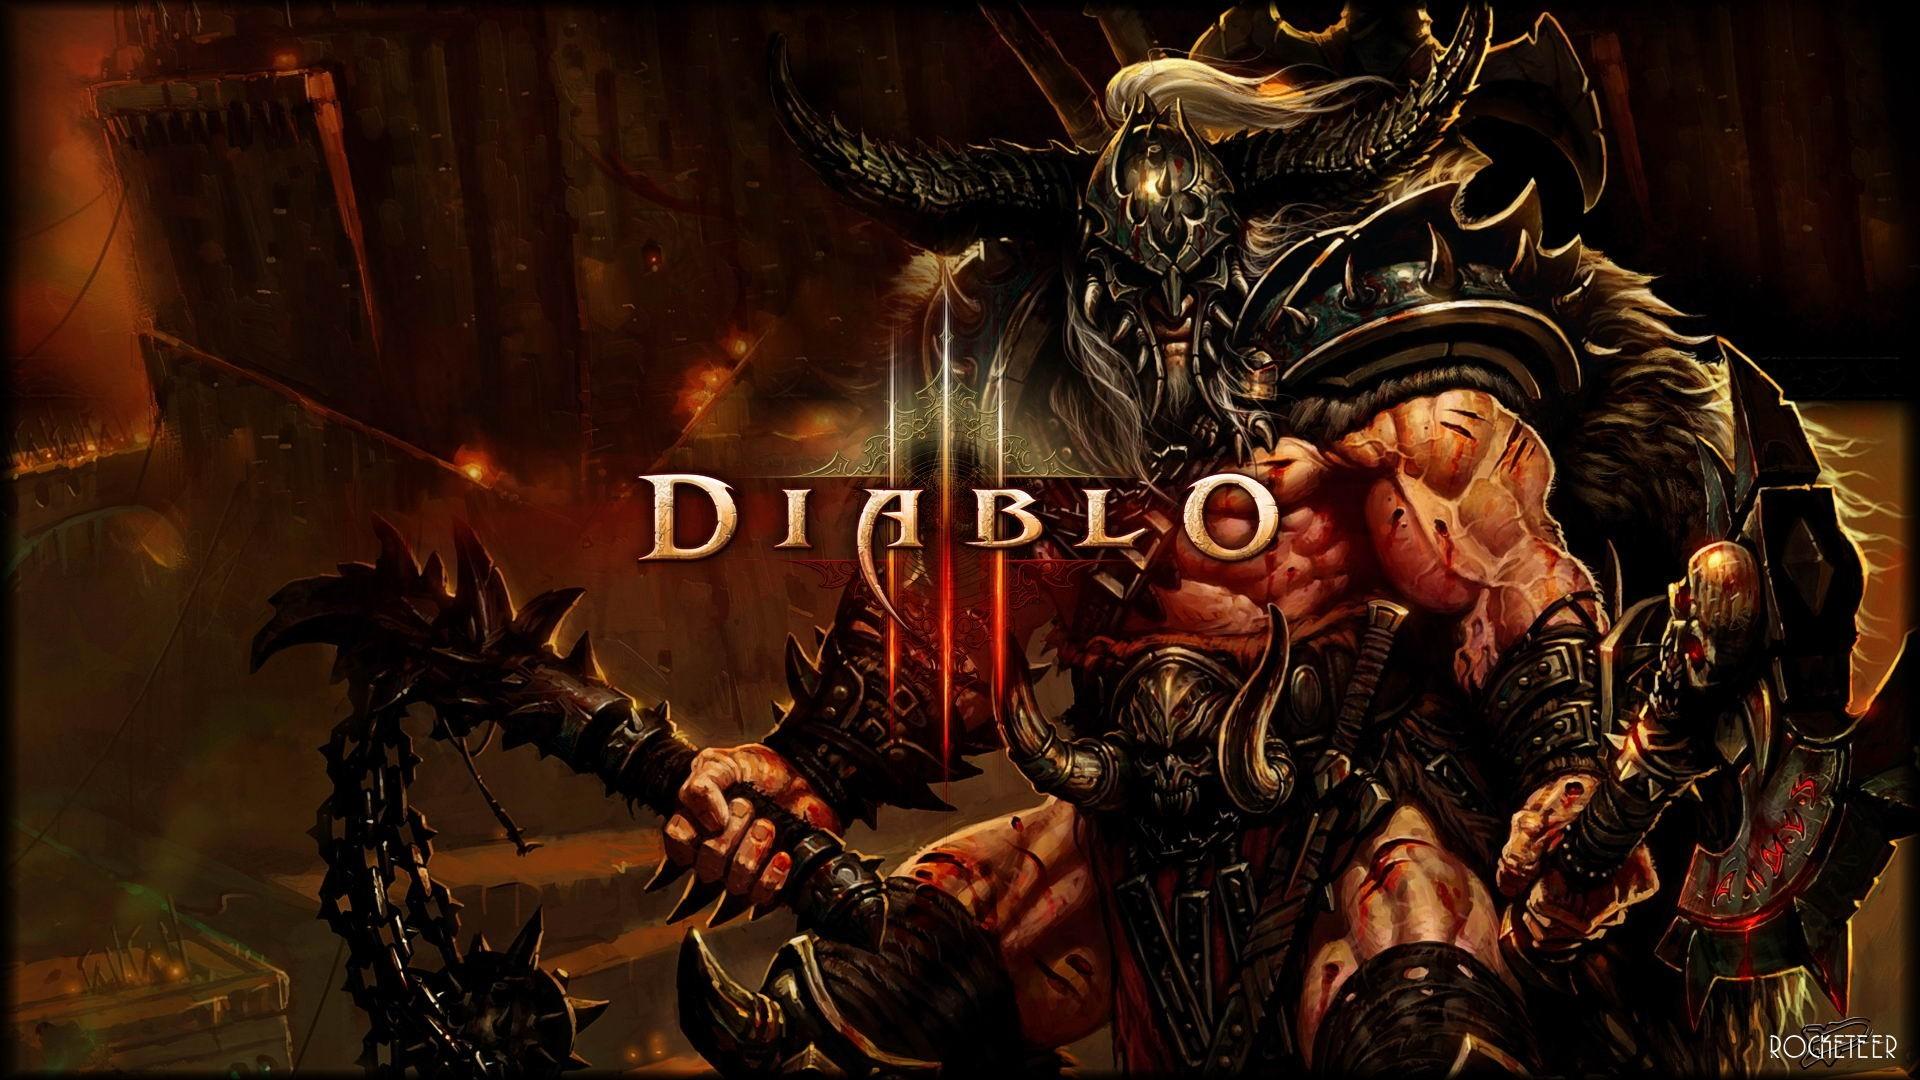 Diablo II HD Wallpapers Backgrounds Wallpaper | HD Wallpapers | Pinterest | Diablo  ii, Hd wallpaper and Wallpaper